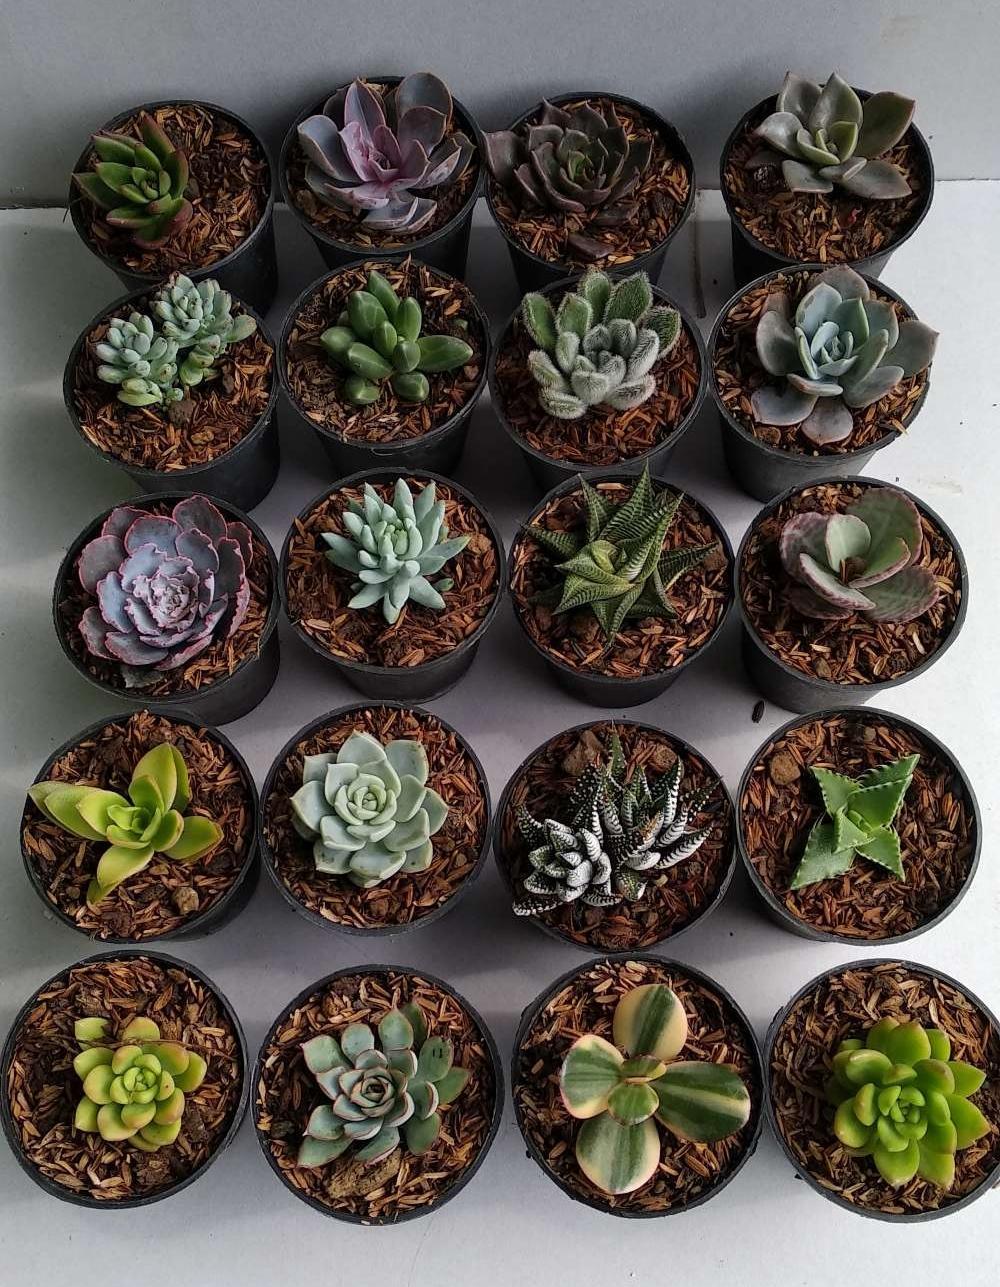 paket tanaman kaktus sukulen 20 plus pot b5b8b1b3f9